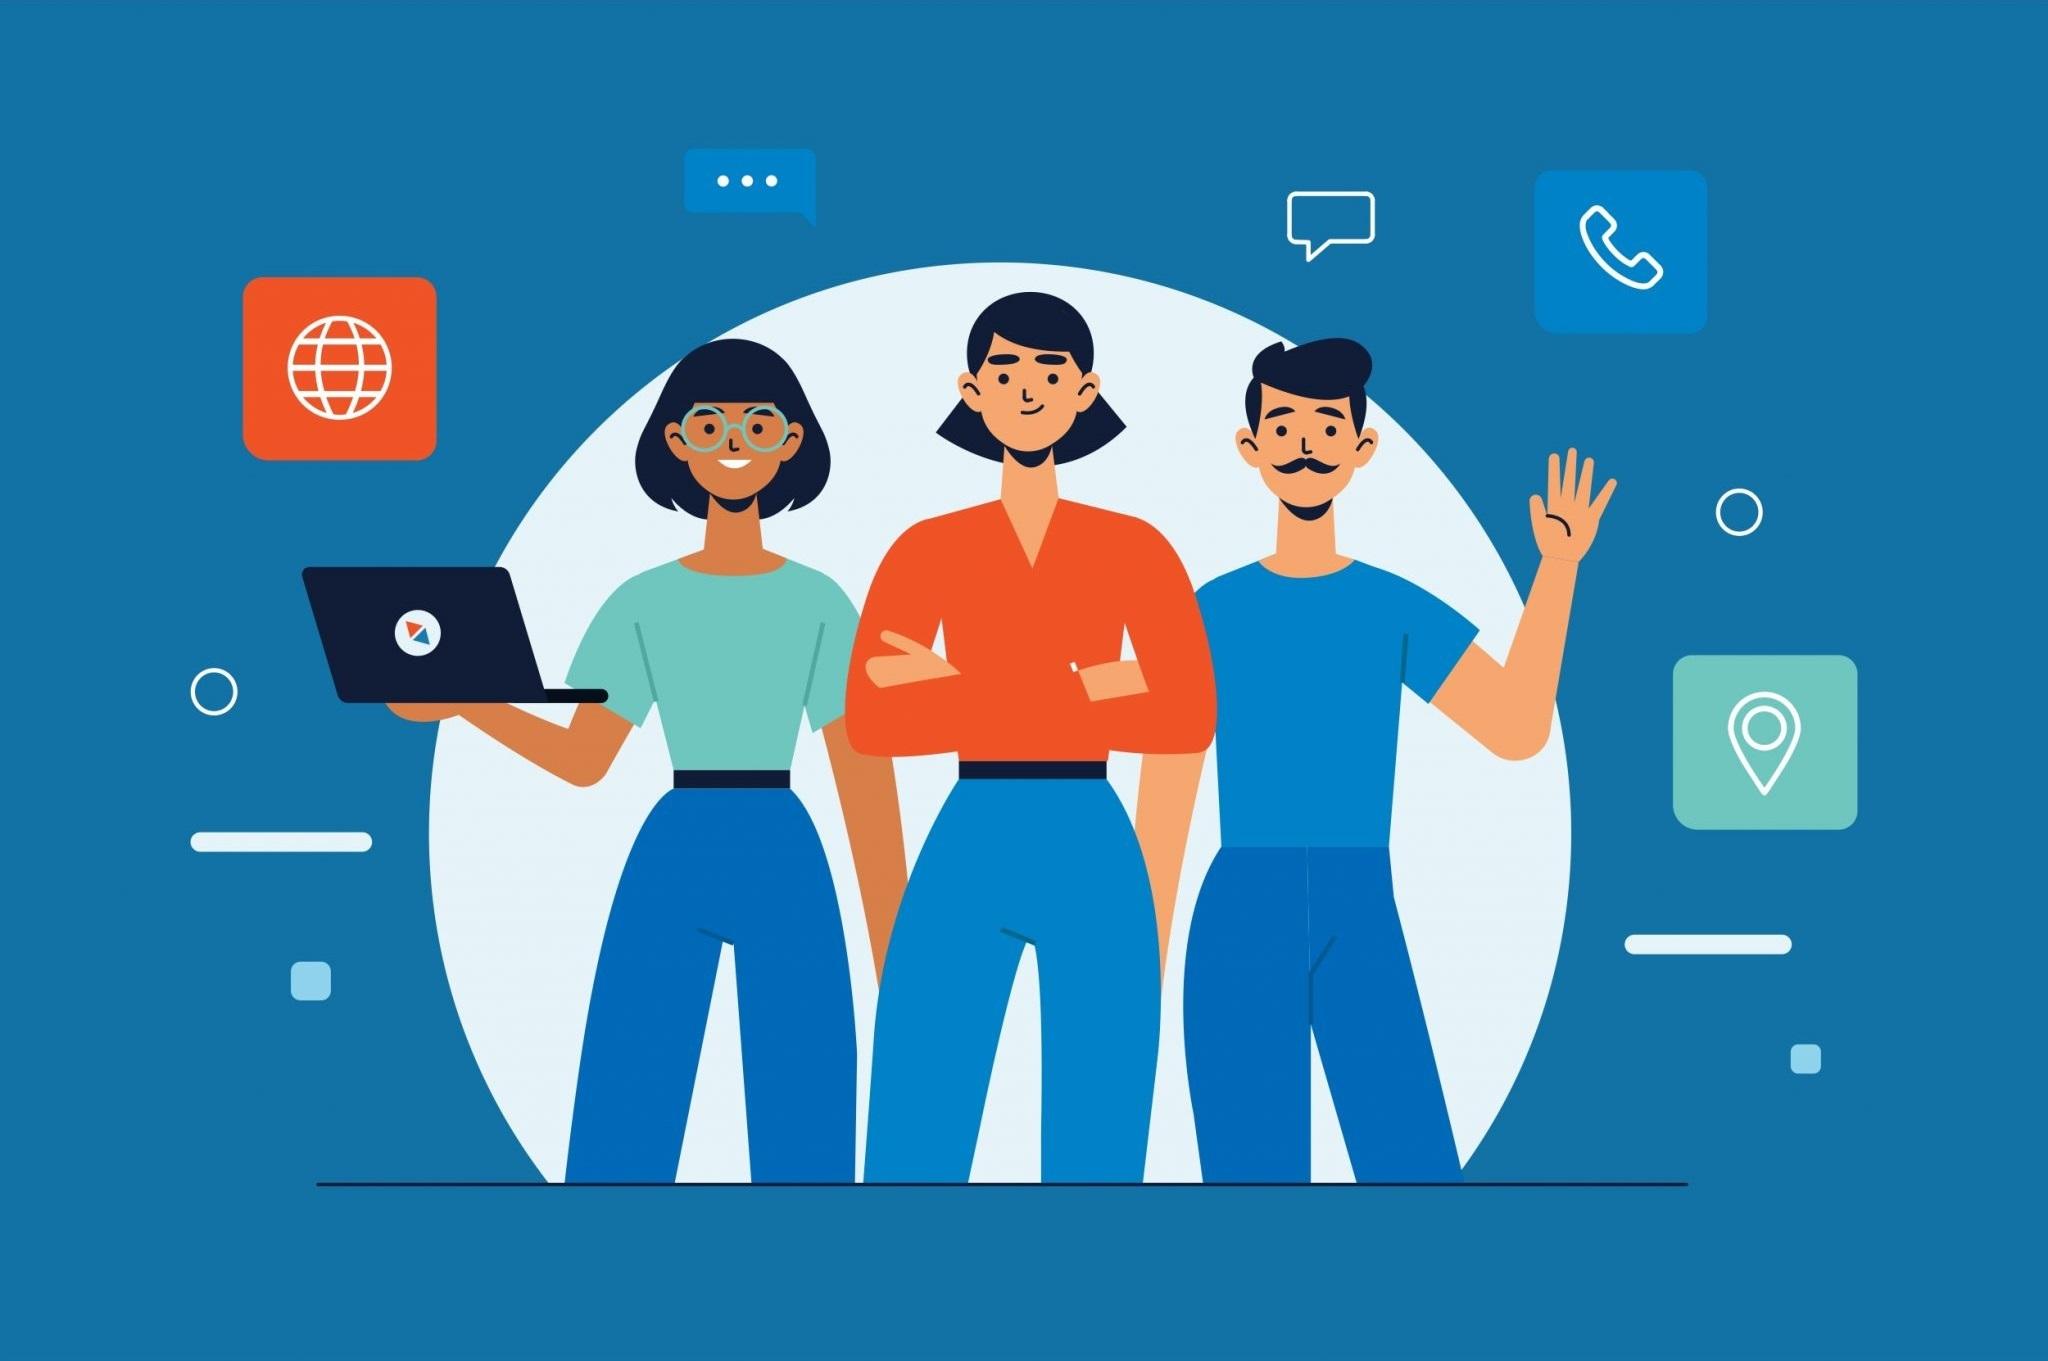 Software development, Mobile development, application modernisations, web design, SEO, data visualisation, technology solutions, mobile app, data visualisation, CRM solutions, CRM Consultancy, staff augmentation, digital transformation, dedicated teams, digital marketing.